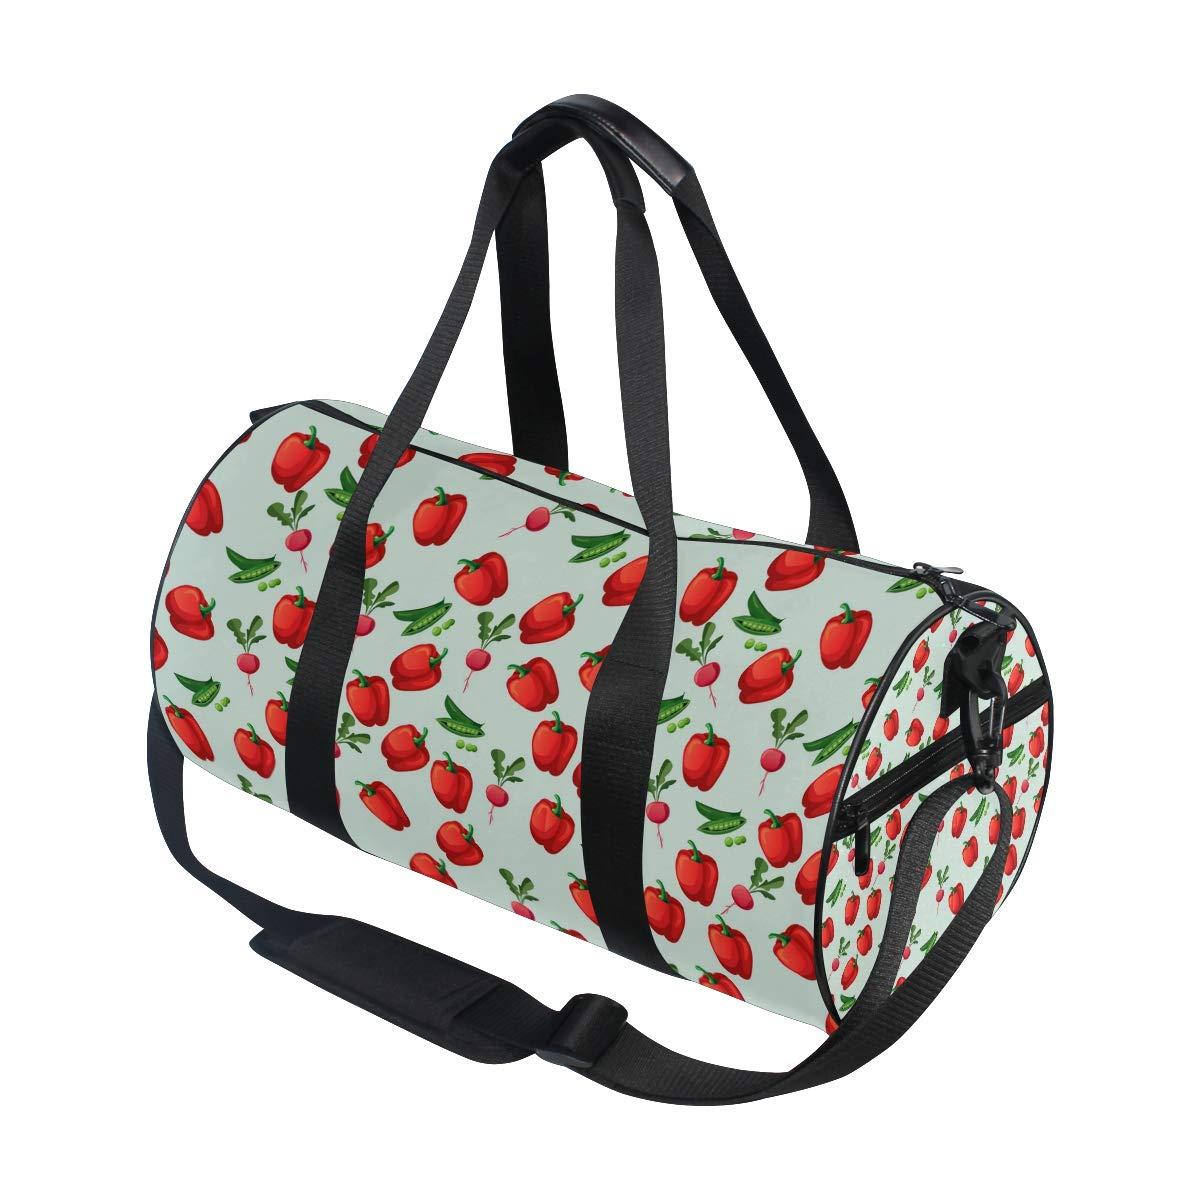 Waterproof Non-Slip Wearable Crossbody Bag fitness bag Shoulder Bag Taro Vegetable Picture